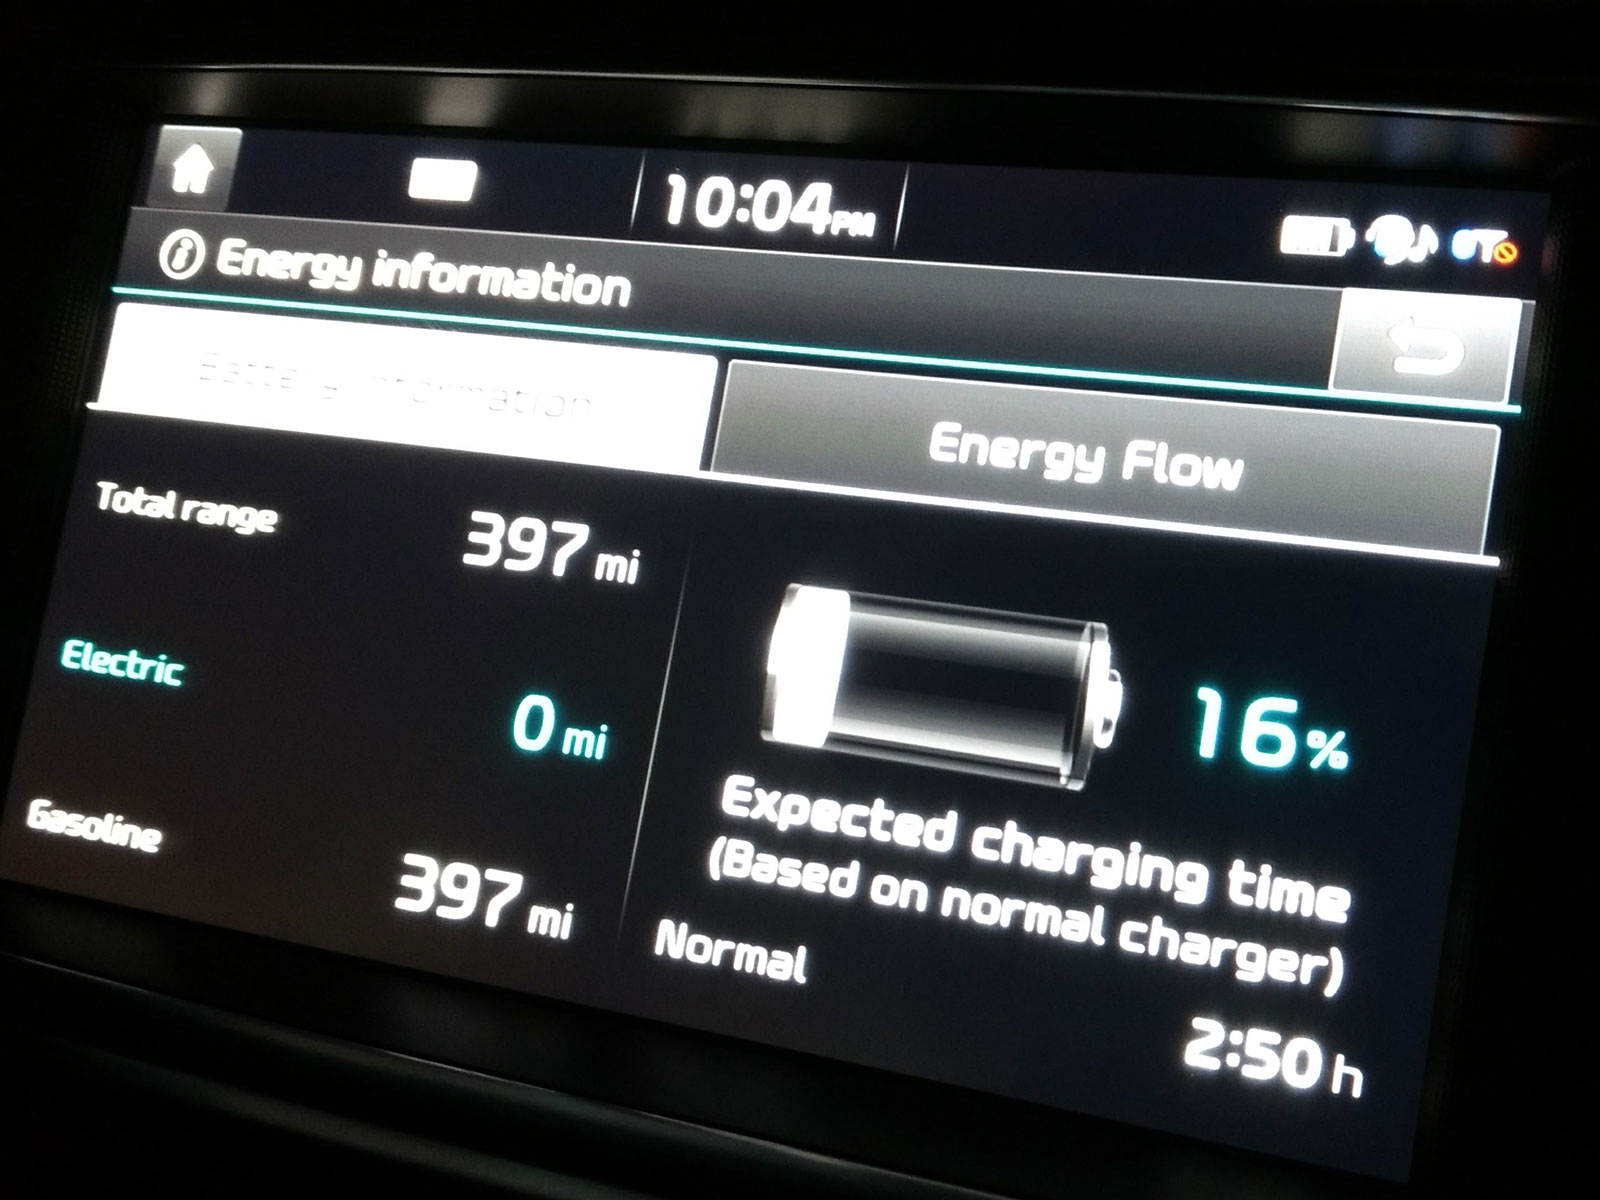 Kia Optima: Battery recharging